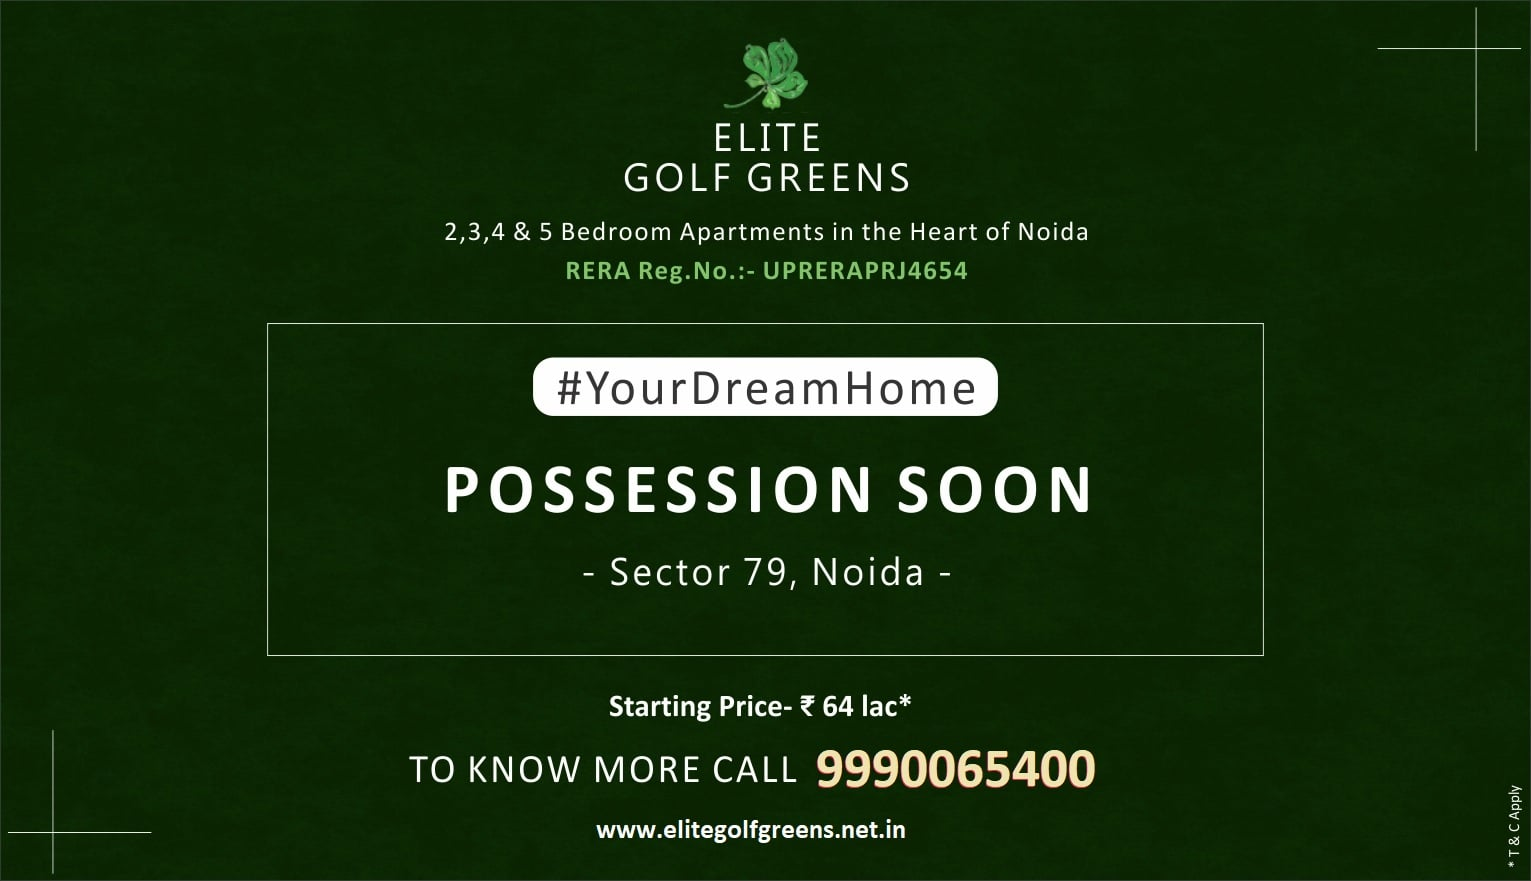 elite golf greens